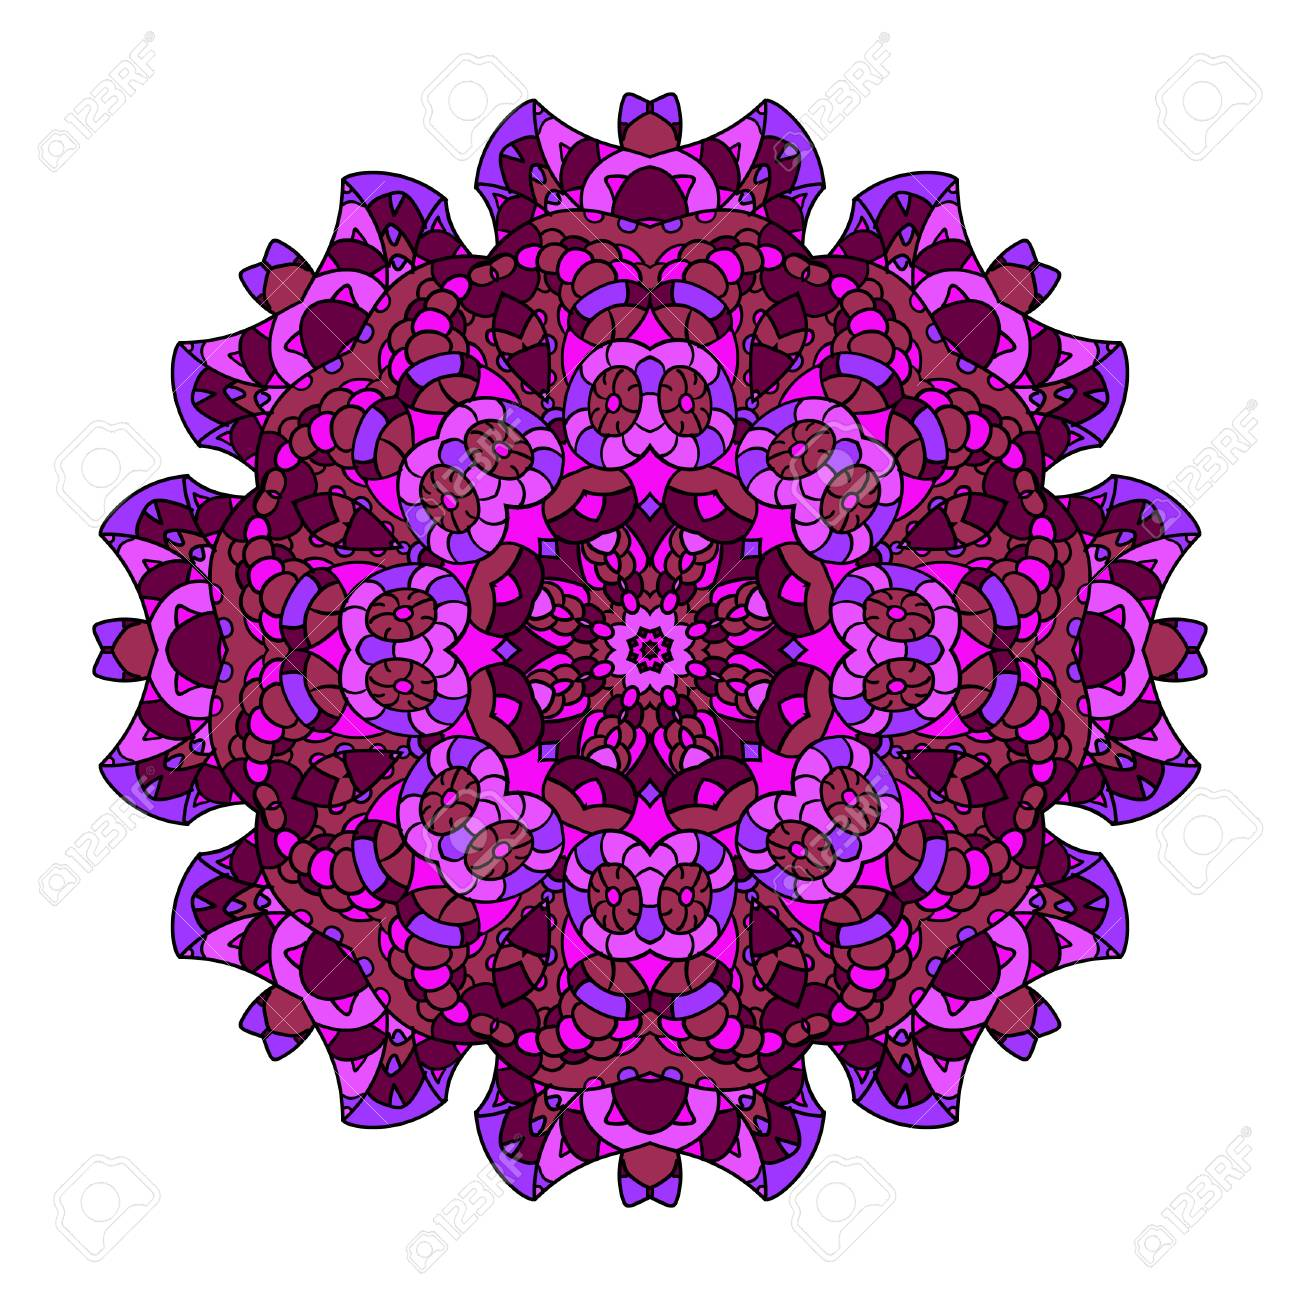 Adorno De Flores Mandala Floral Para Imprimir Carteles Pancartas Folletos Tarjetas De Invitación